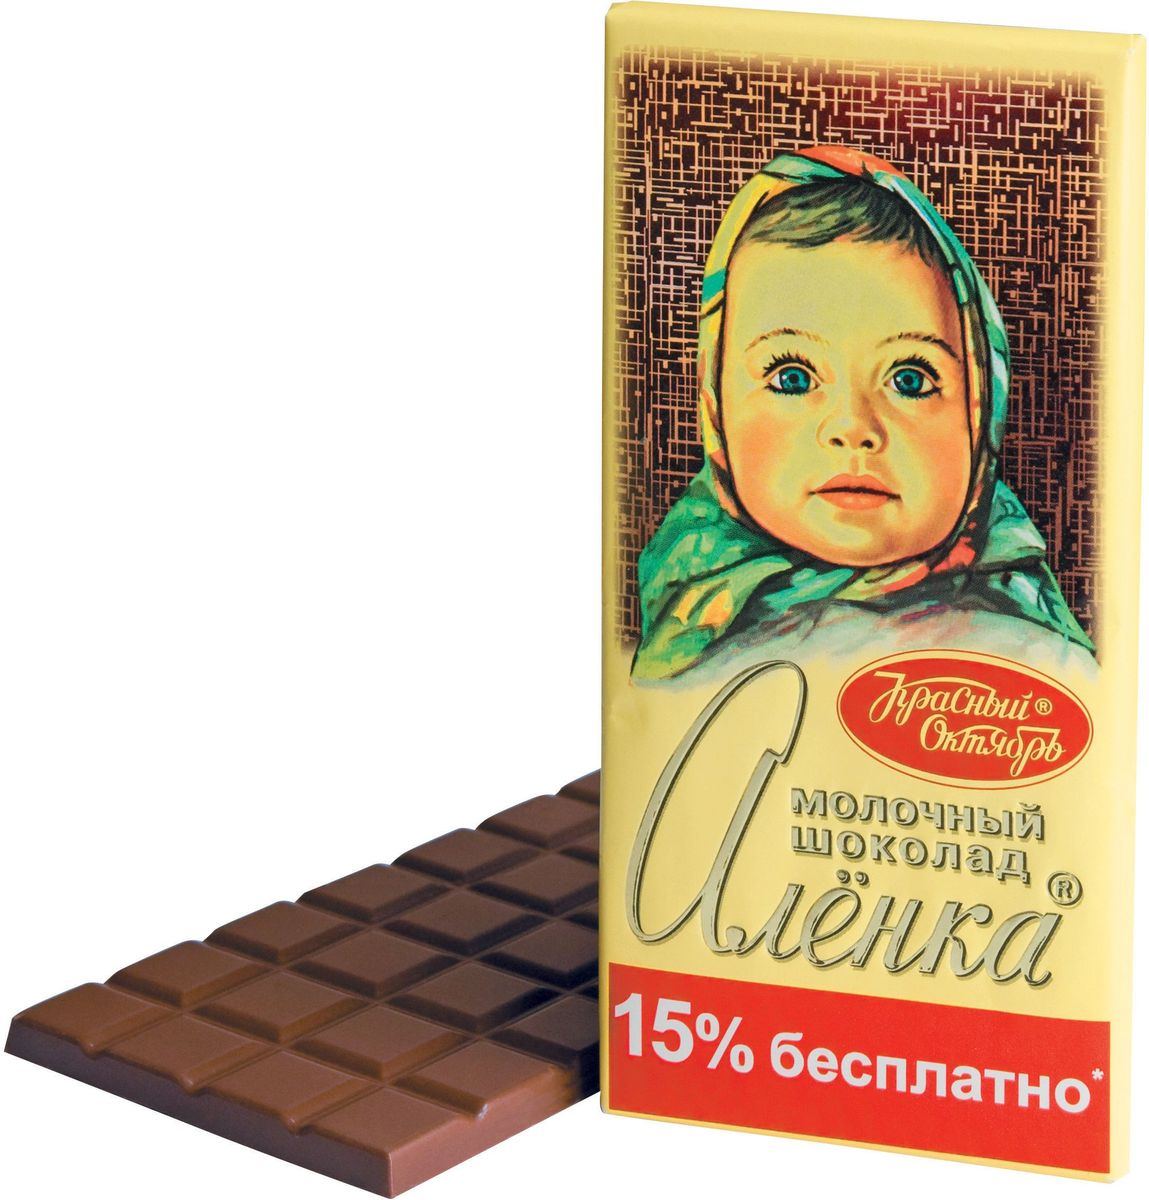 Красный Октябрь Аленка молочный шоколад, 200 г куплю шкуры куницы 2014 год октябрь